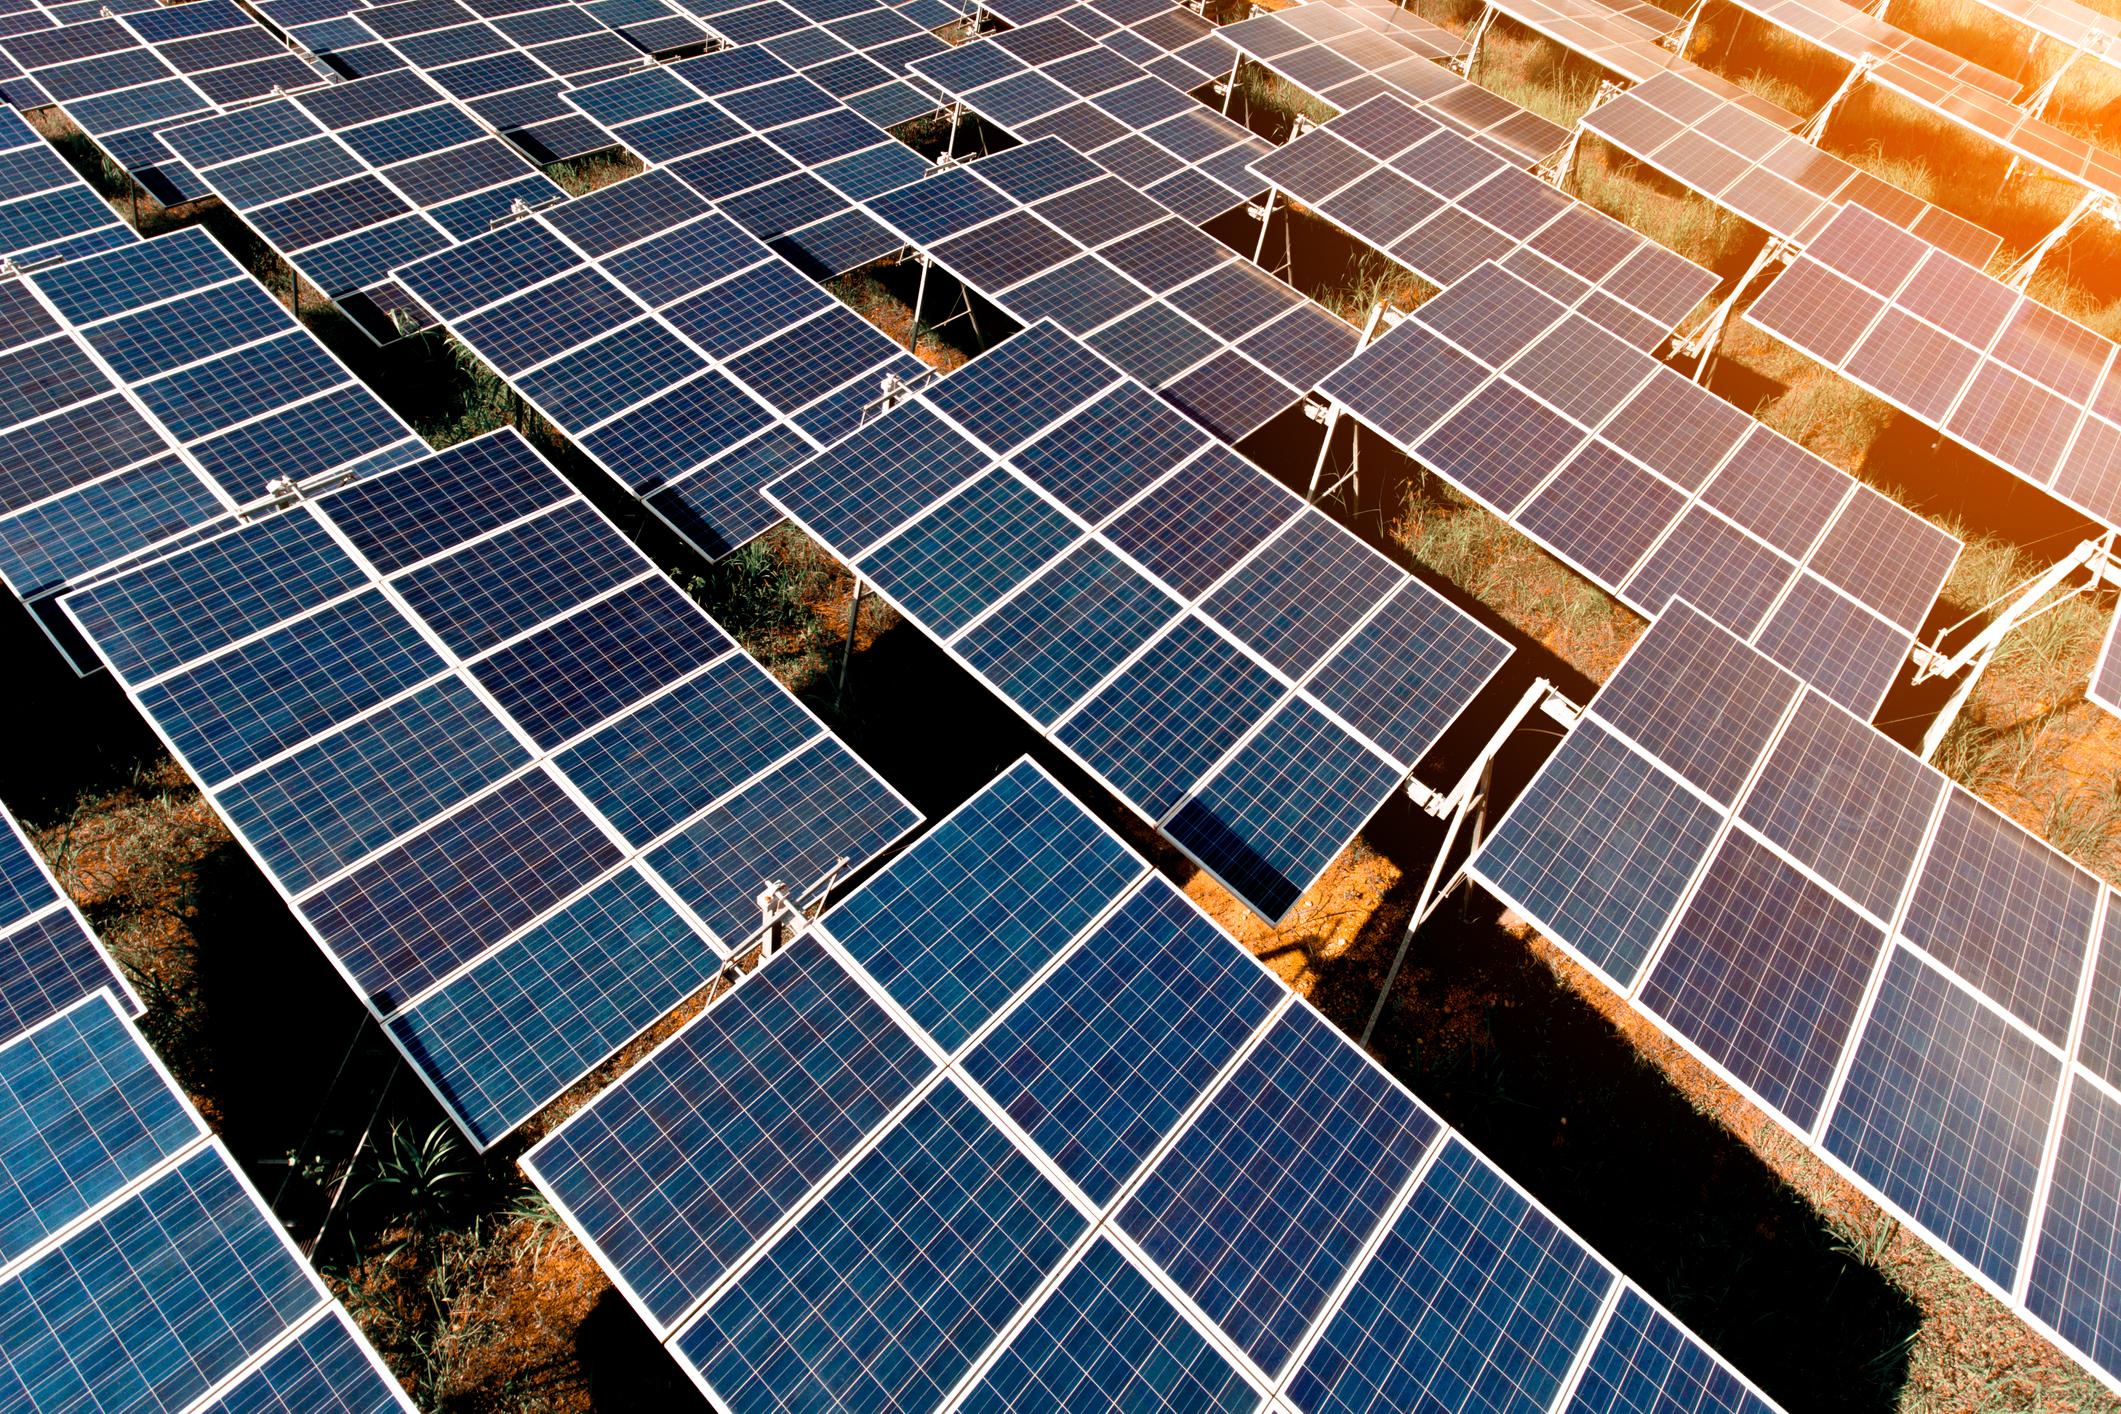 A large solar farm with the sun shining down.